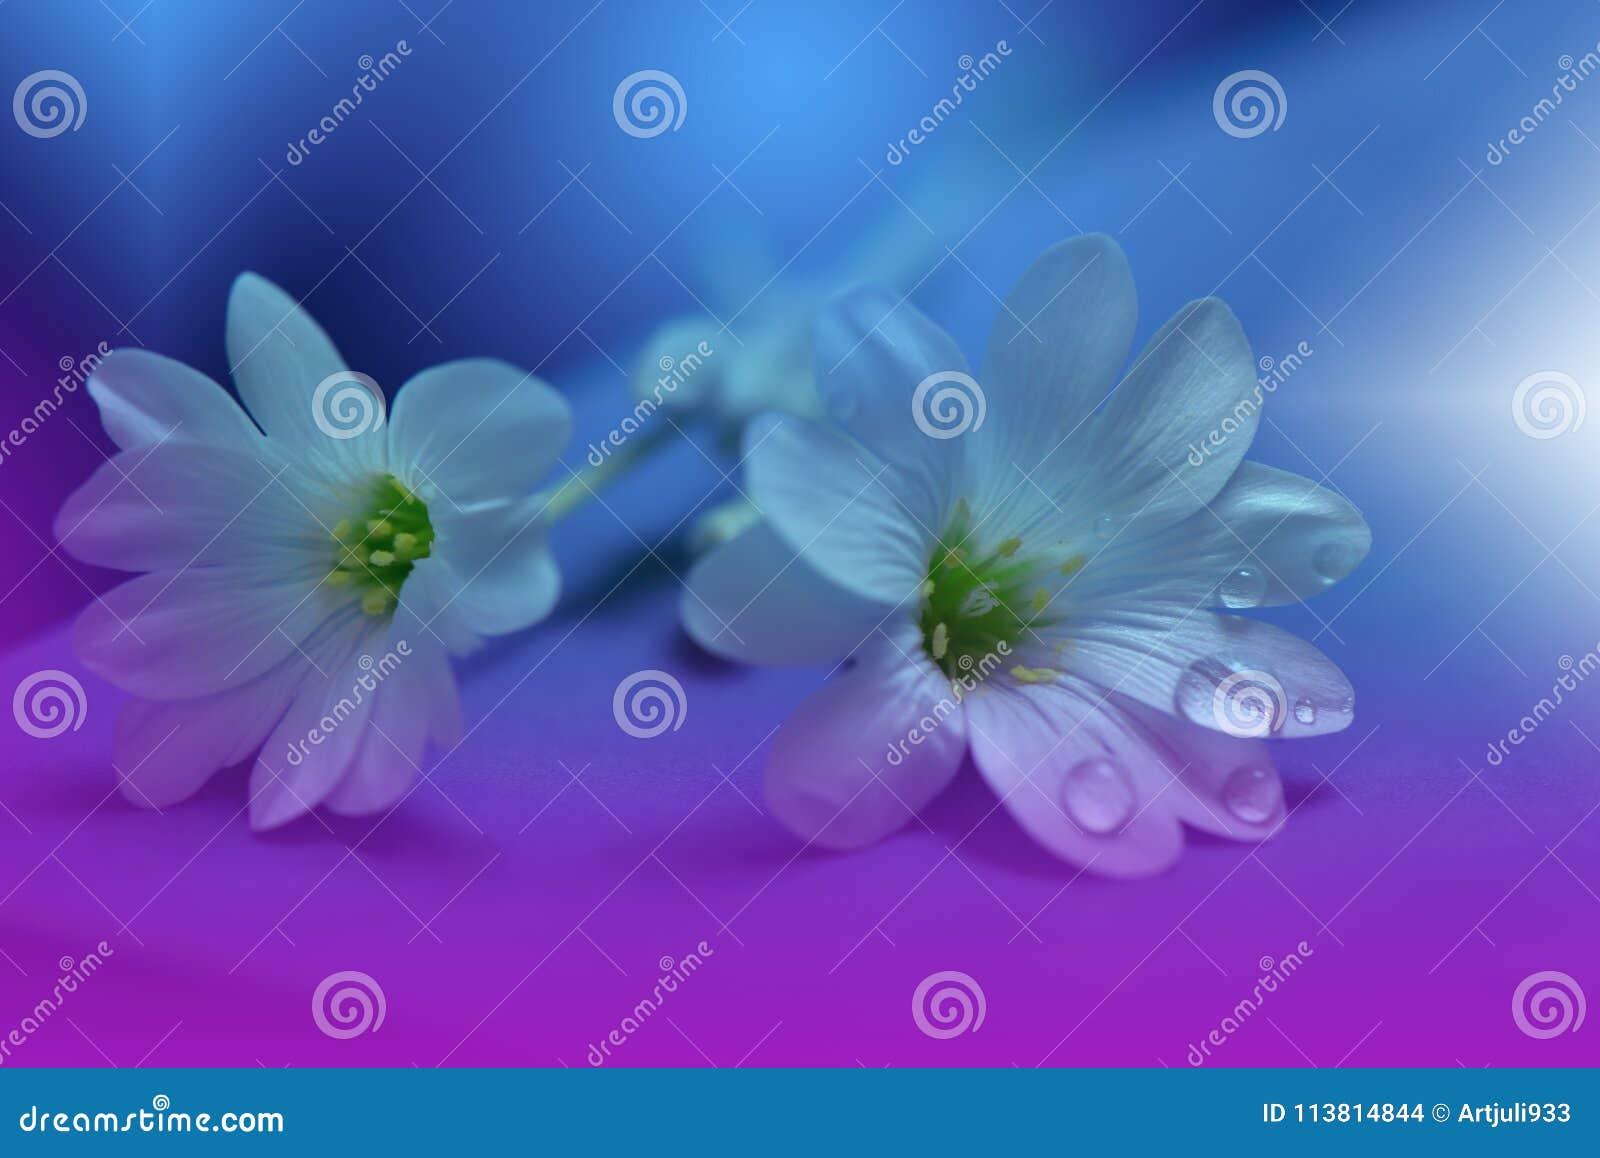 Art Abstract Spring Floral Background Design Purple Flower